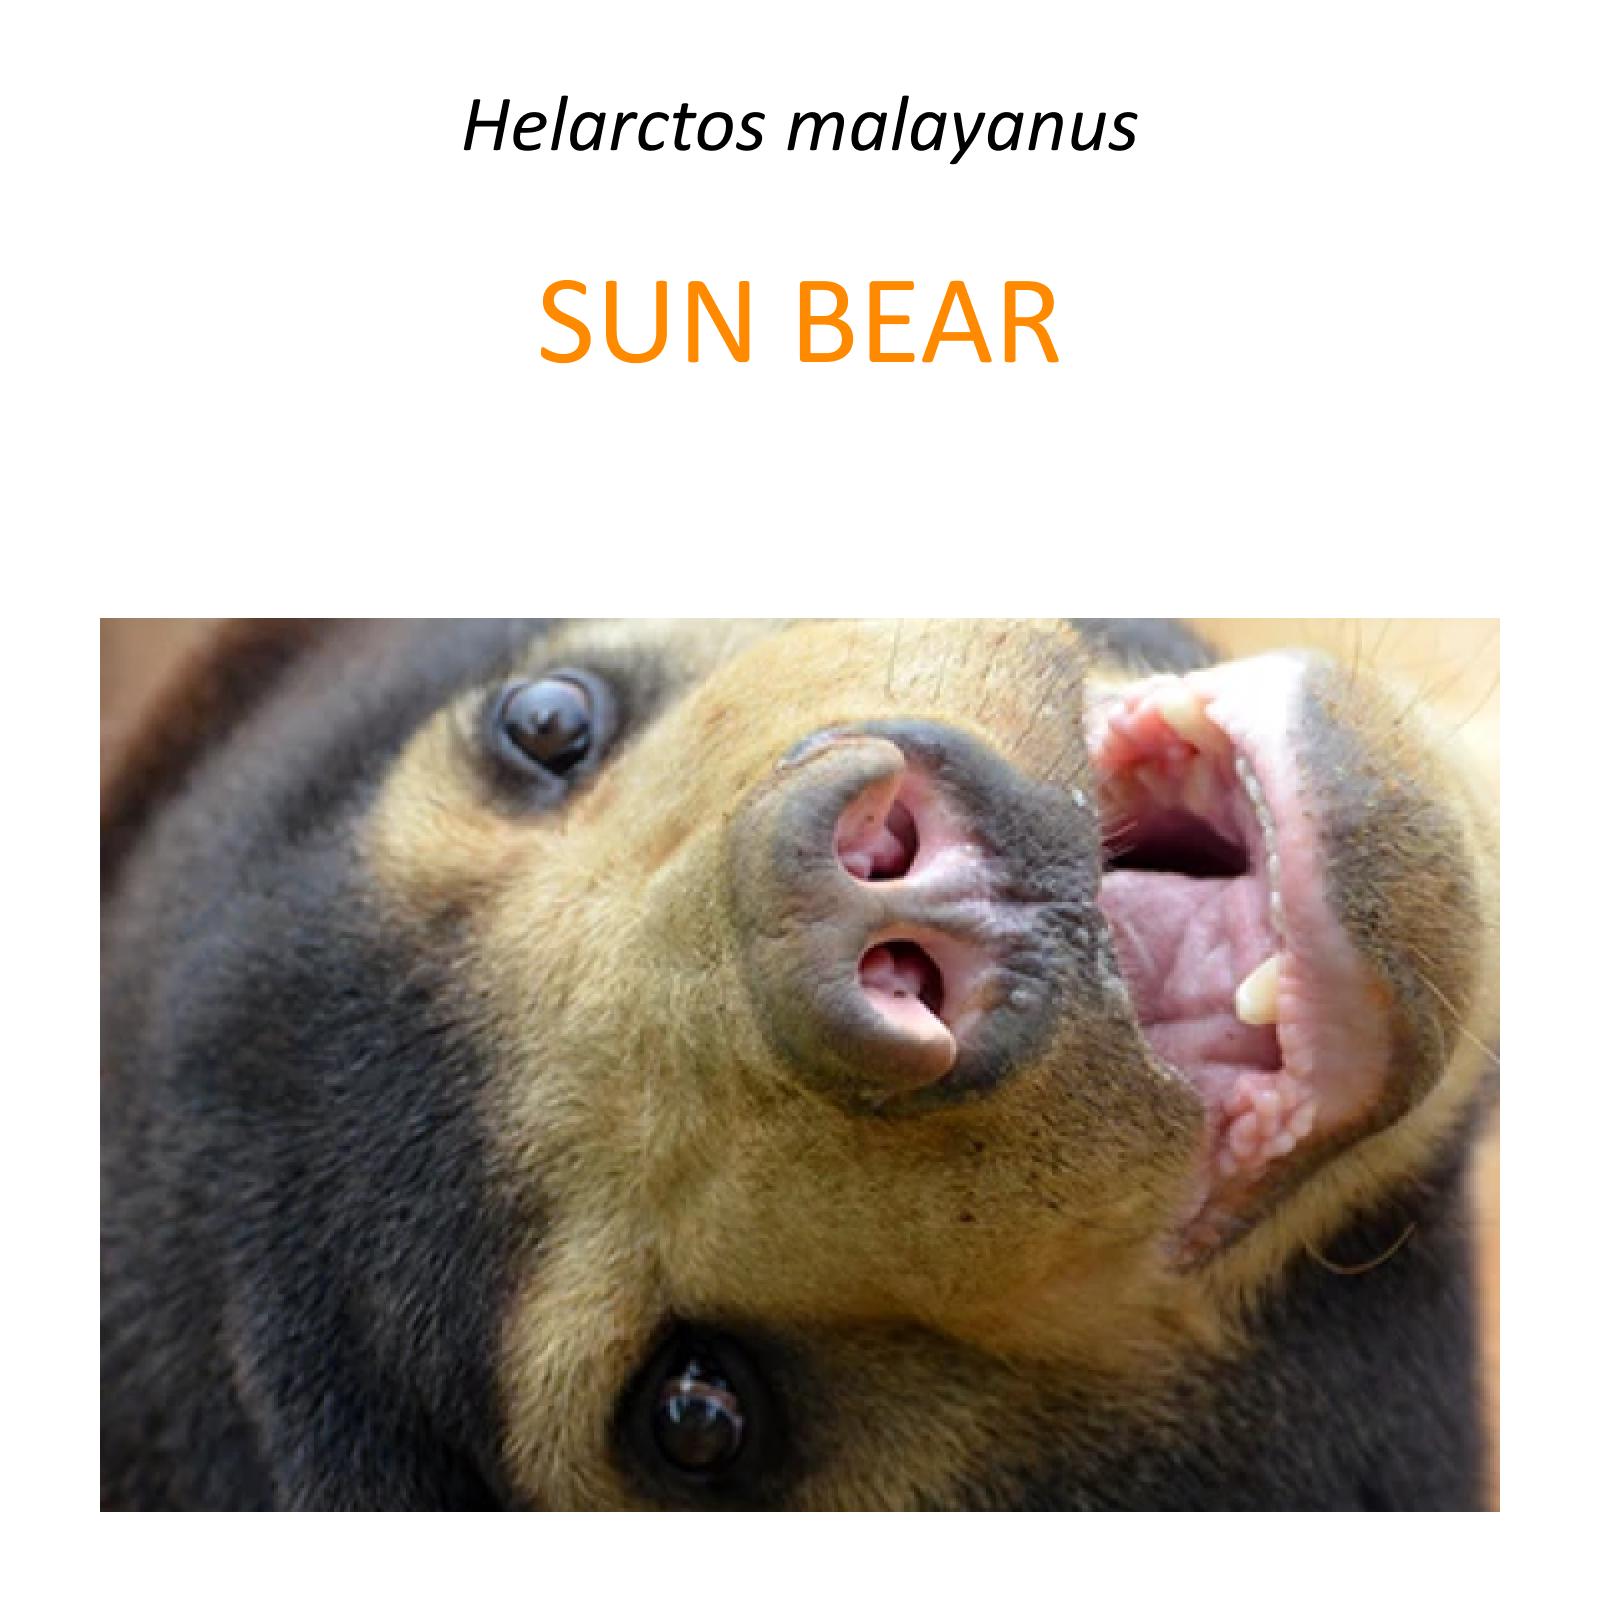 Sun bear rescue program